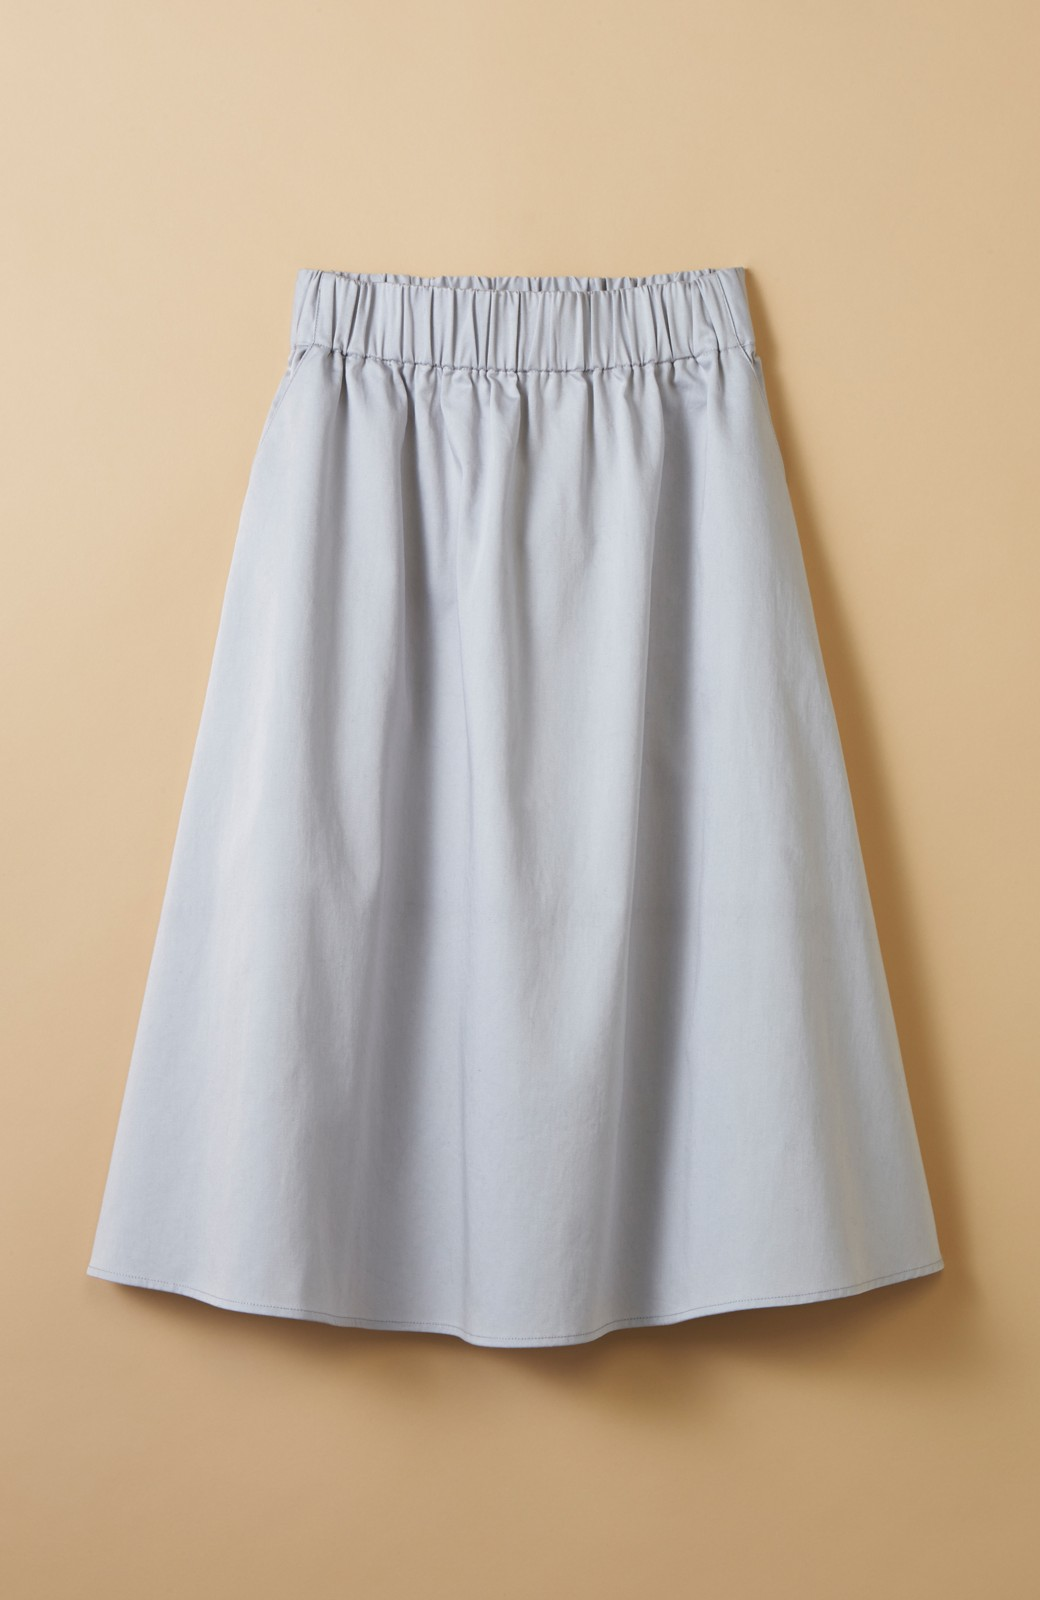 haco! ミモレ丈のフレアースカート by que made me <ライトグレー>の商品写真1